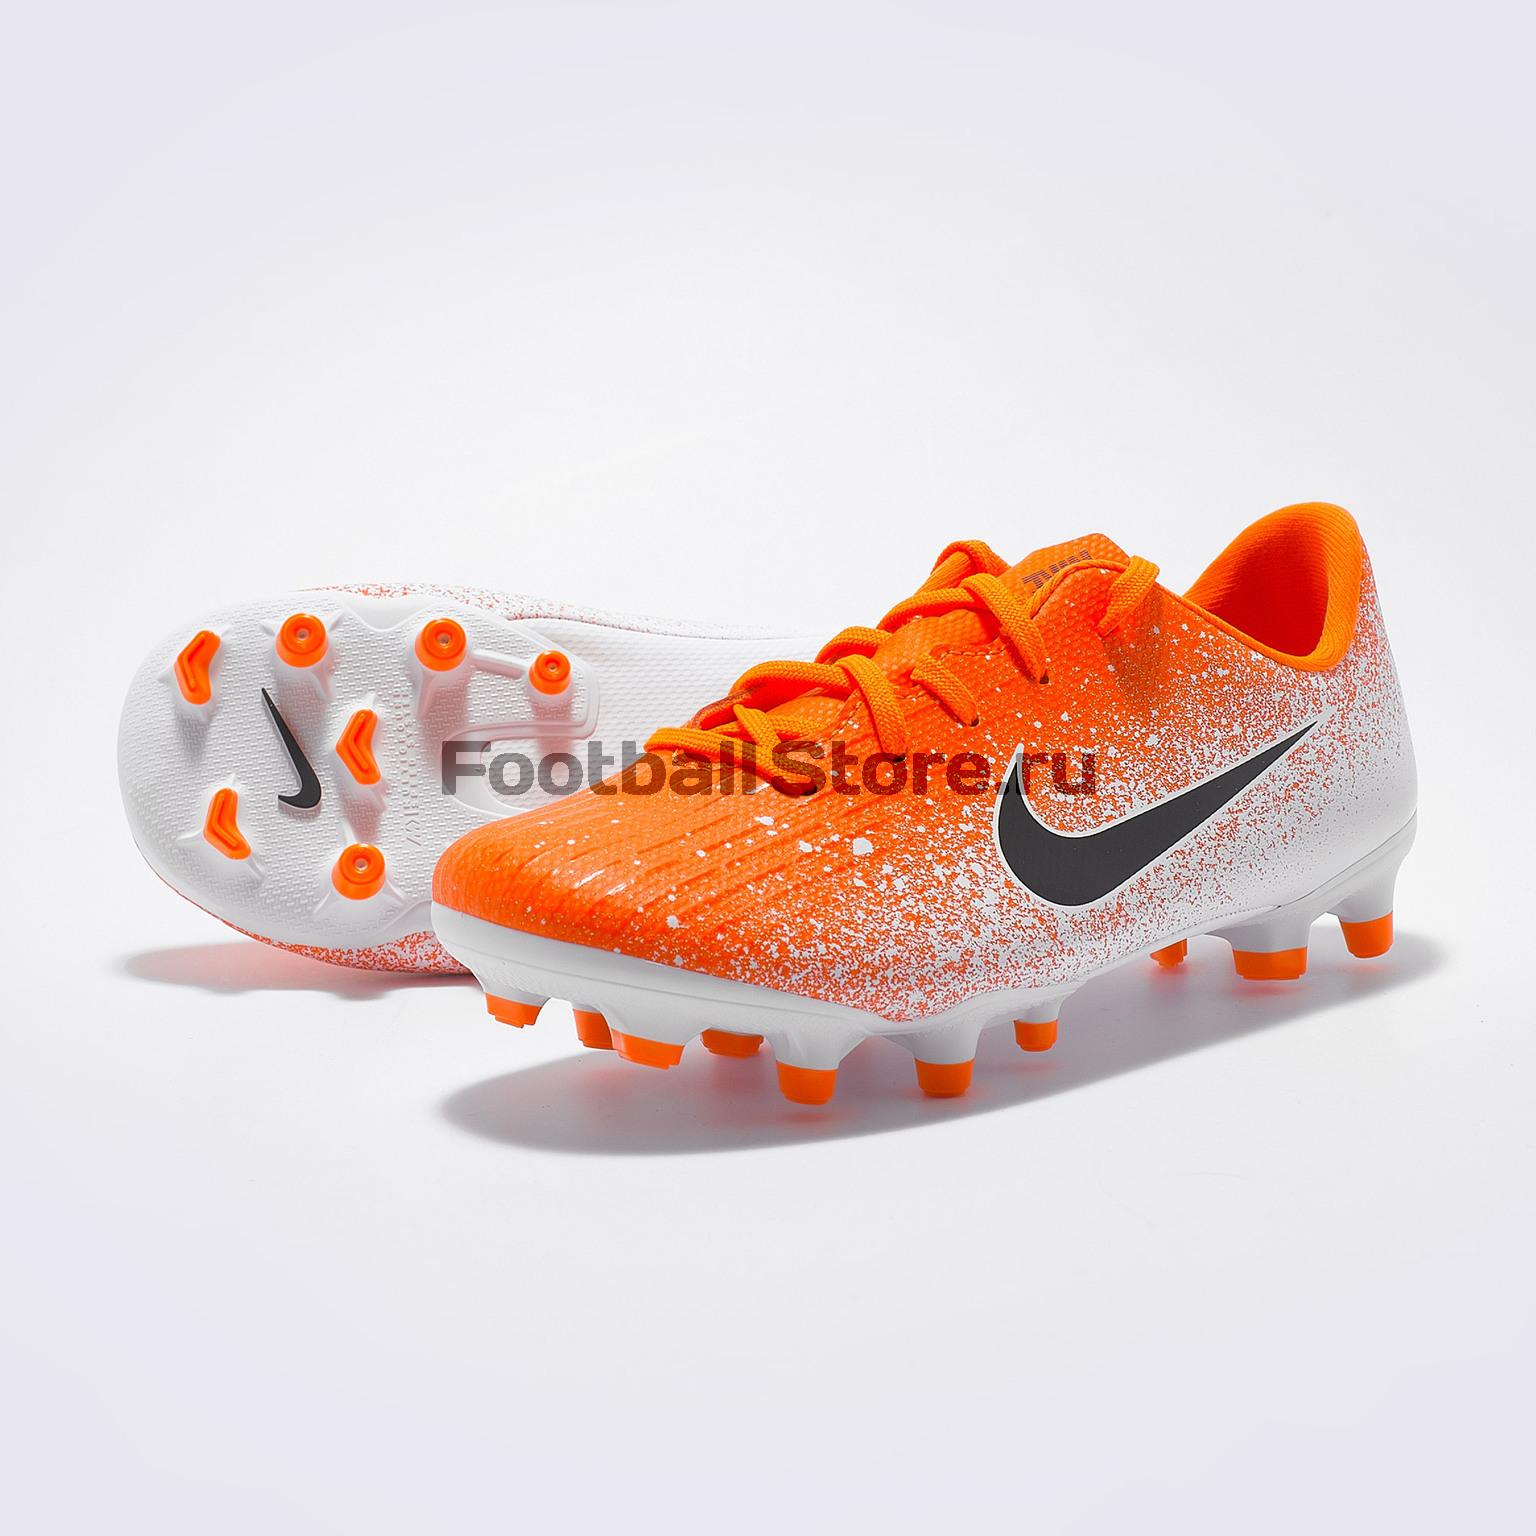 Бутсы детские Nike Vapor 12 Academy PS FG/MG AH7349-801 бутсы детские nike vapor 12 academy gs fg mg ah7347 070